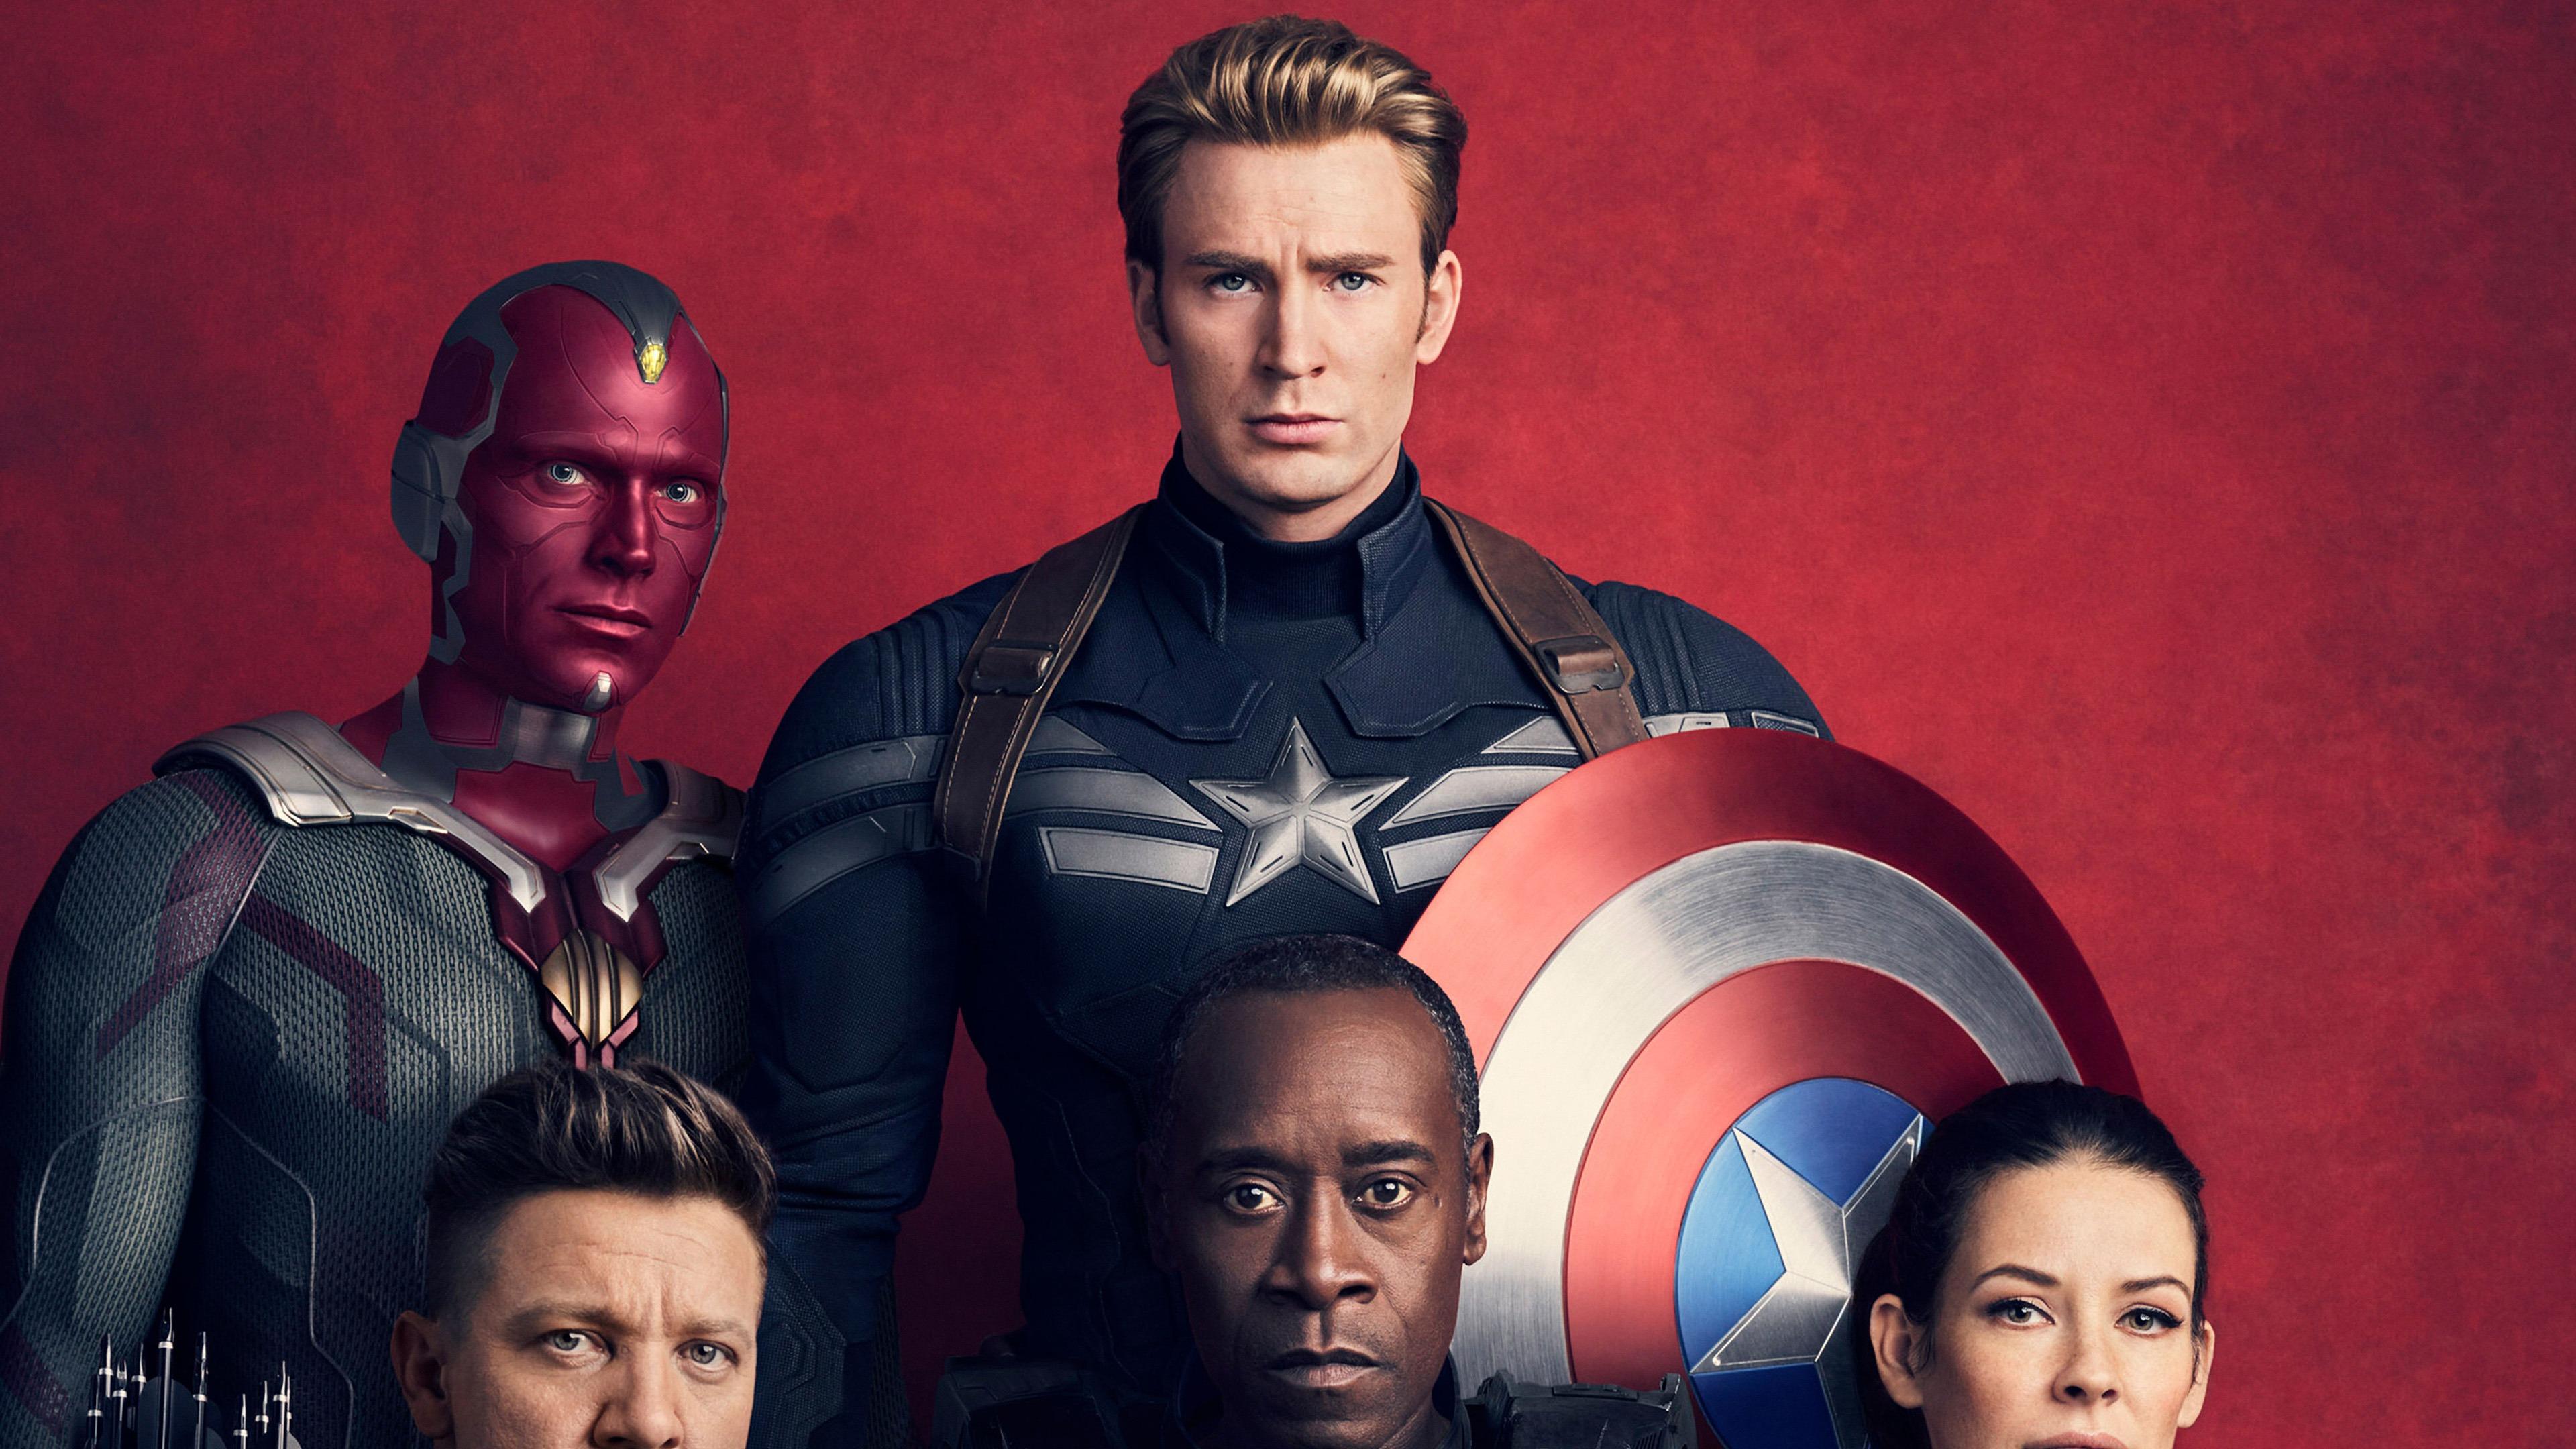 Avengers Infinity War 2018 4k Film Preview 10wallpapercom